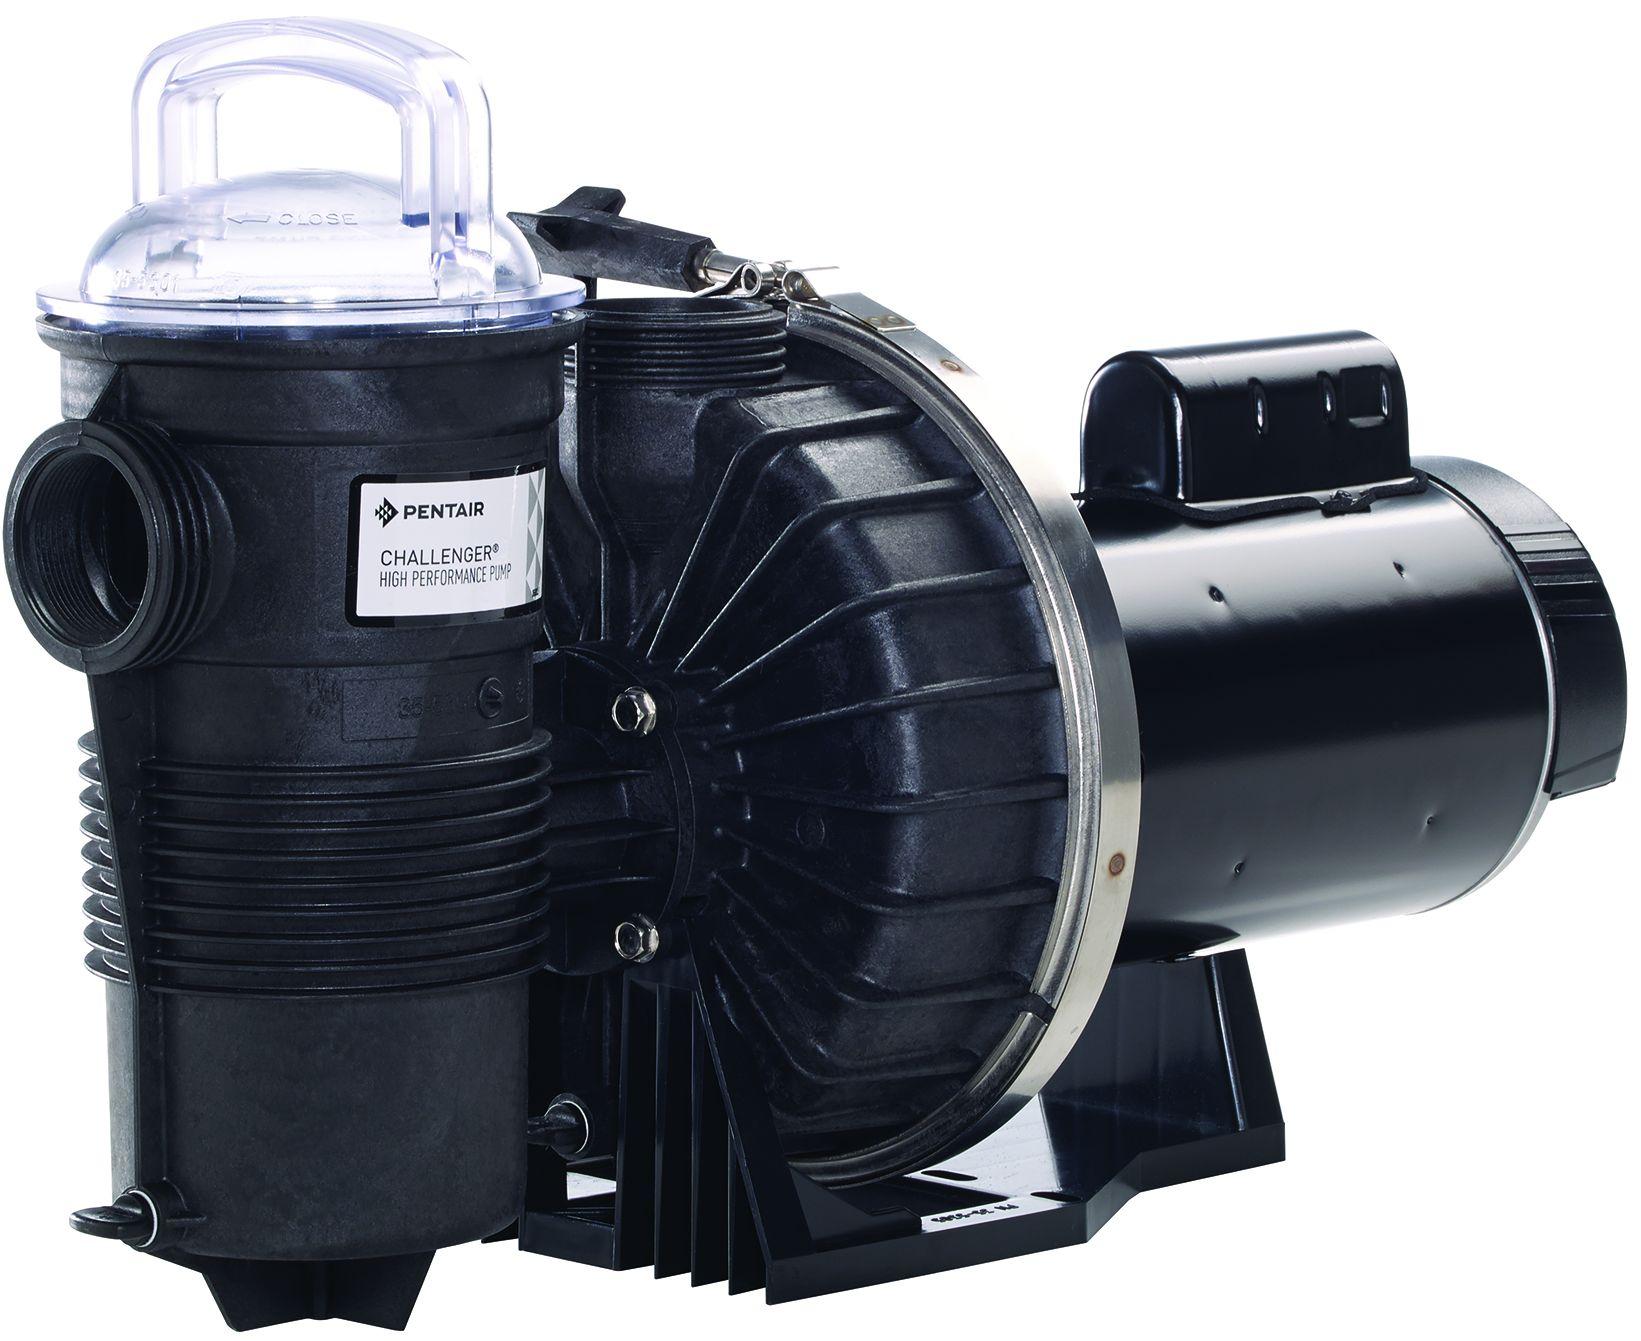 ch11 n1 3fe pentair challenger pool pump halogen supply. Black Bedroom Furniture Sets. Home Design Ideas